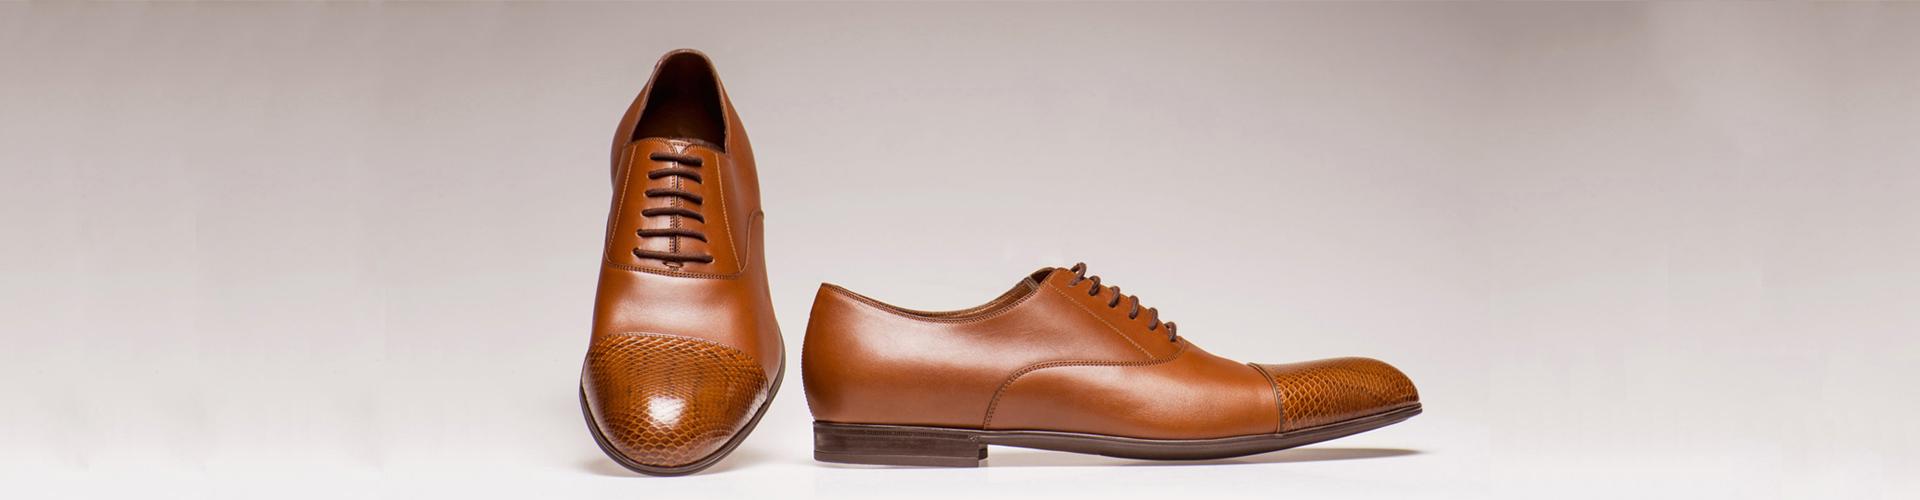 Quality Dress Shoe Sole \u0026 Rubber Sole